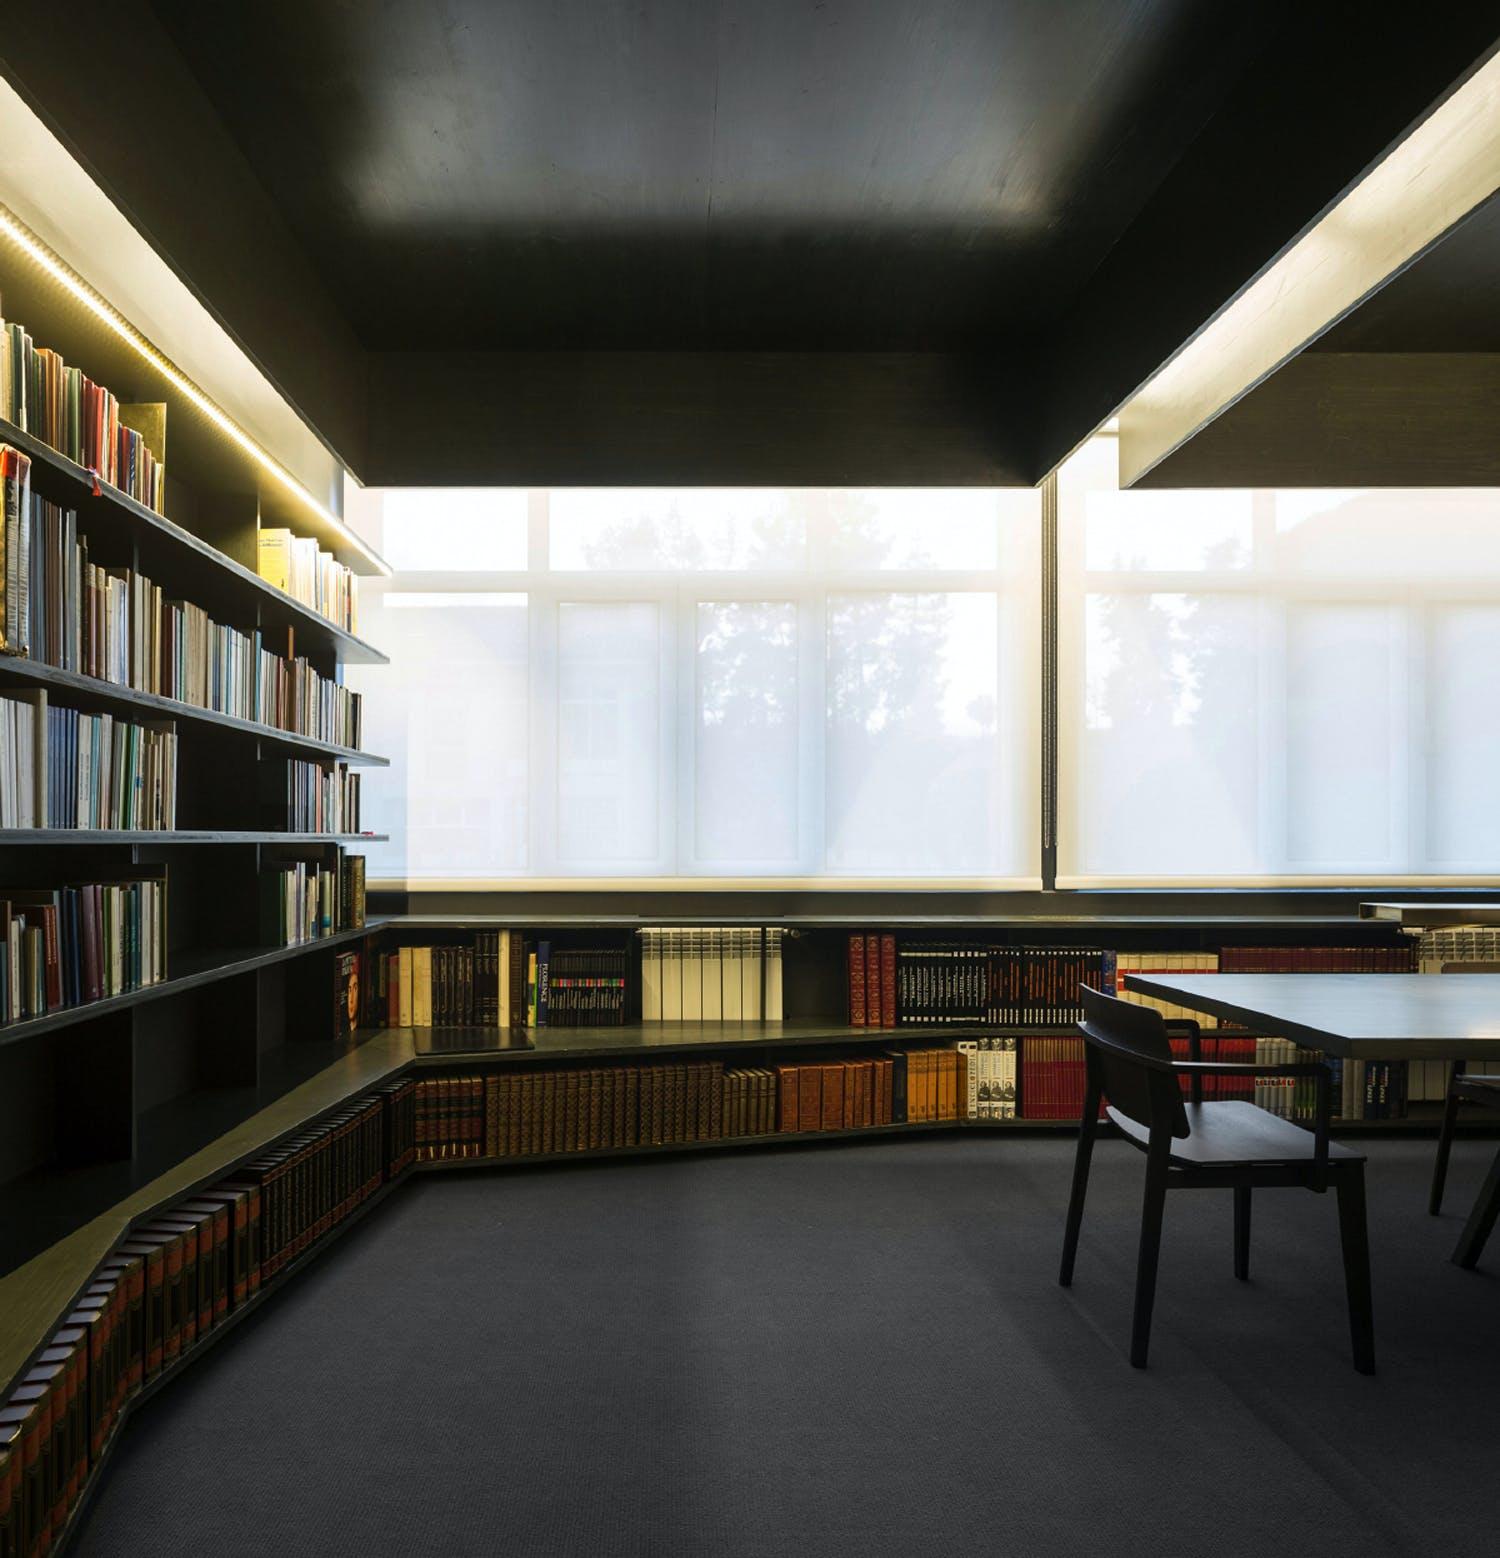 2015 FAD Interior Design Award Biblioteca So Paulo By Patricia Marques And J Costa Photo Credit FG SG Fernando Guerra